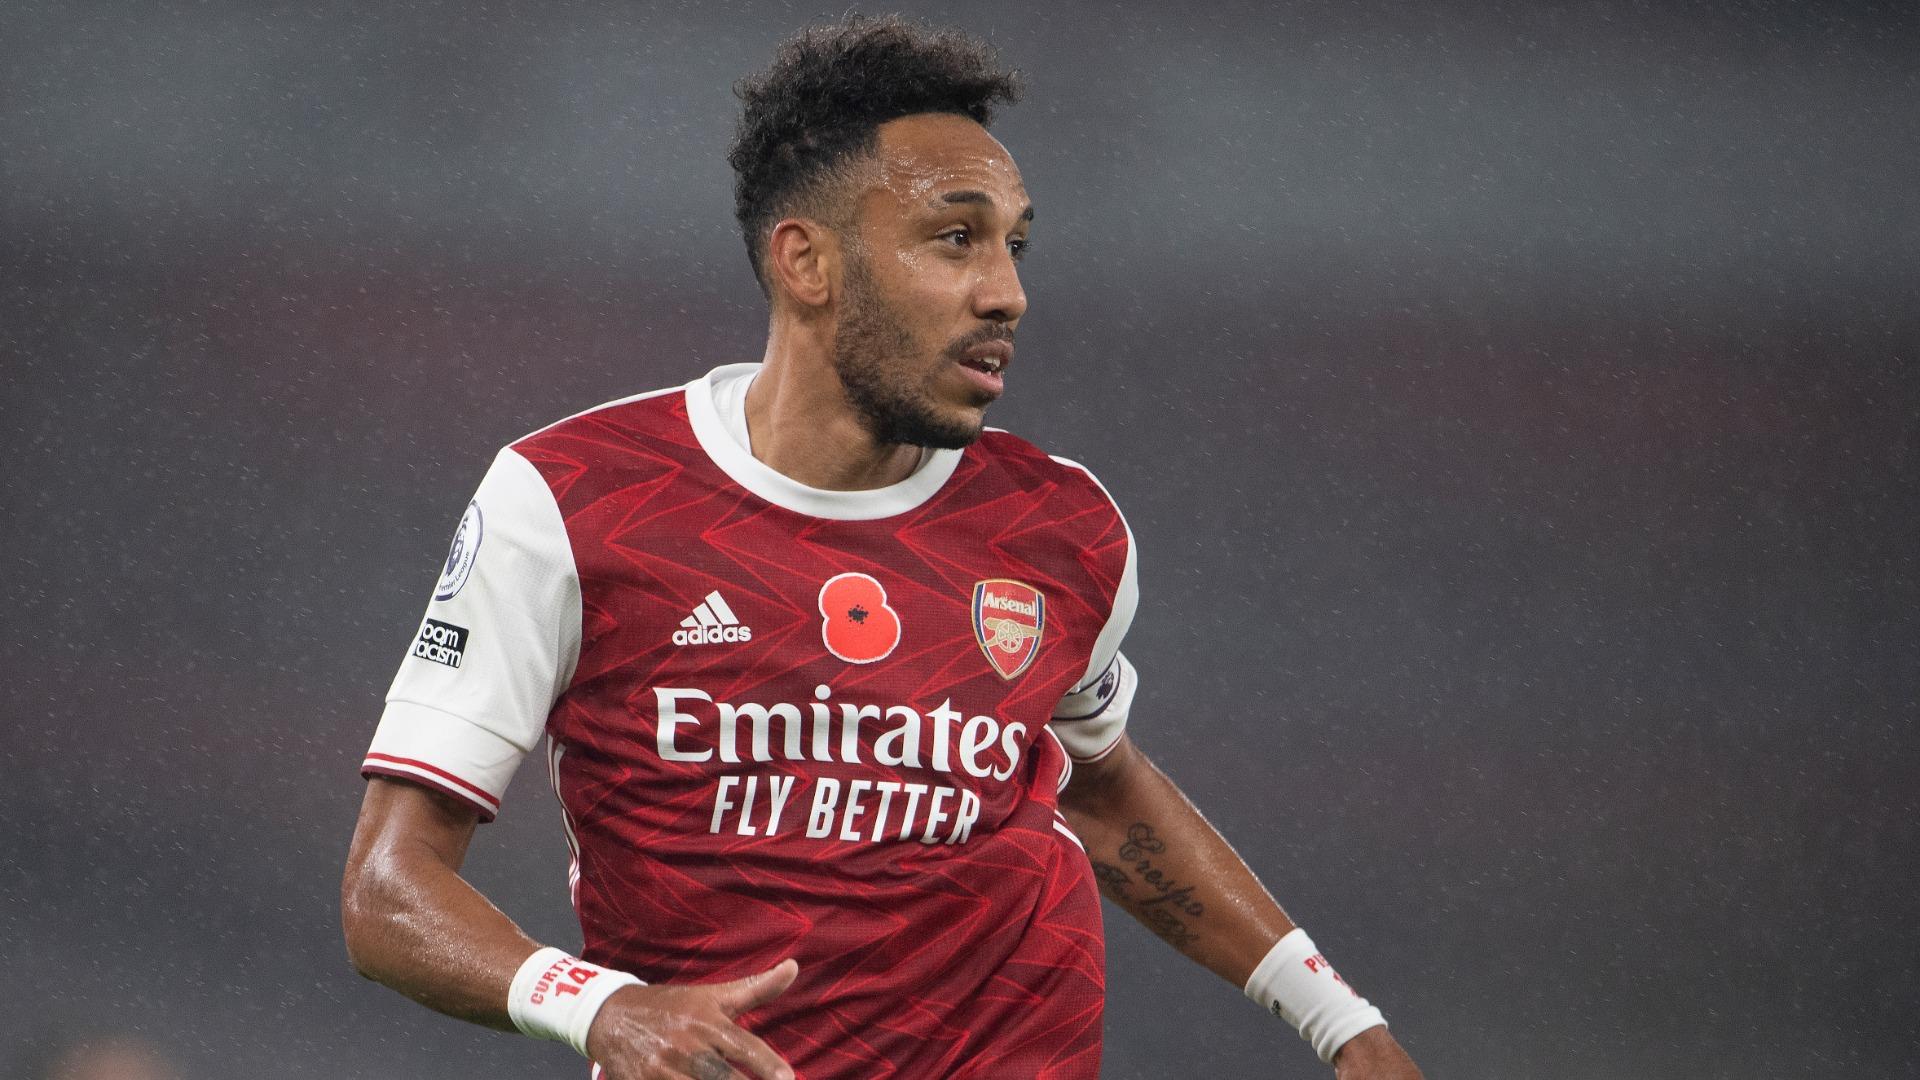 Arsenal's Aubameyang misses Everton clash with calf injury